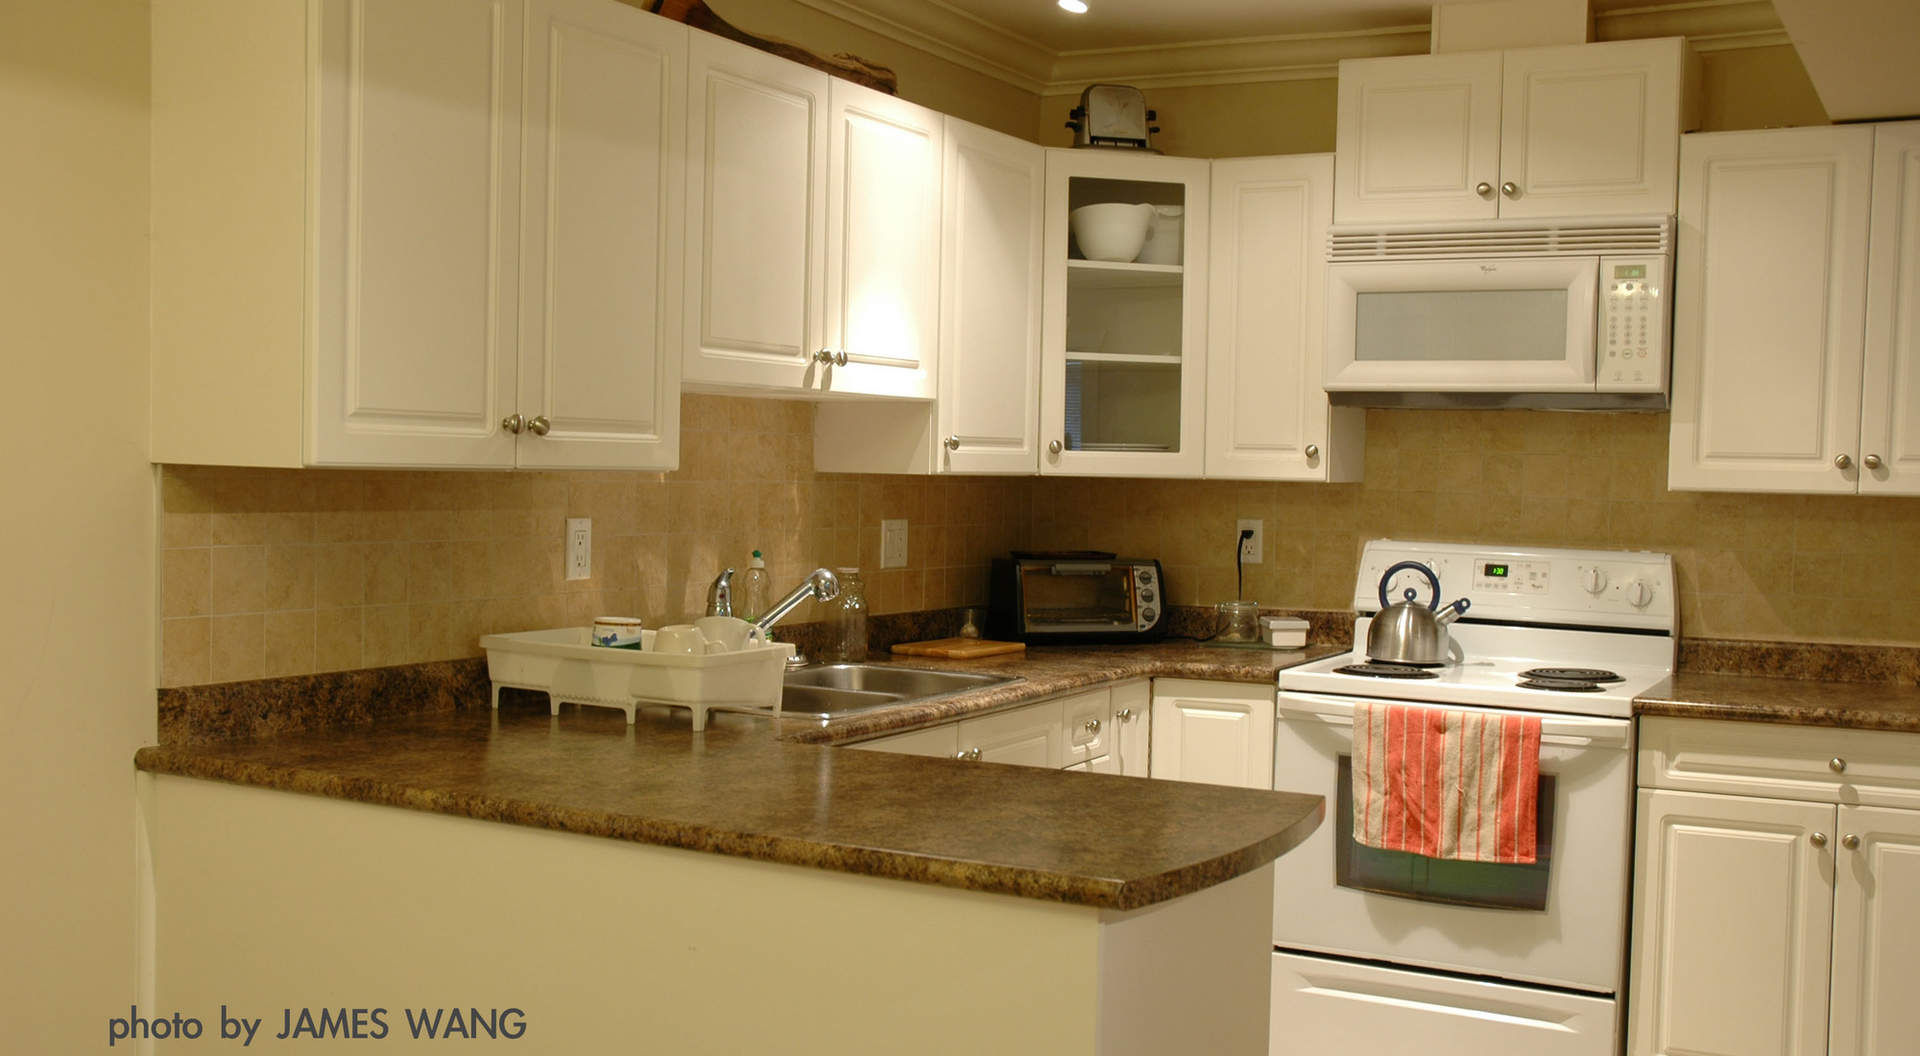 lg kitchen suite cost for remodel 1385 frederick road 西温哥华住房与地产 加拿大不列颠哥伦比亚省 com top of page 美食厨房的套房